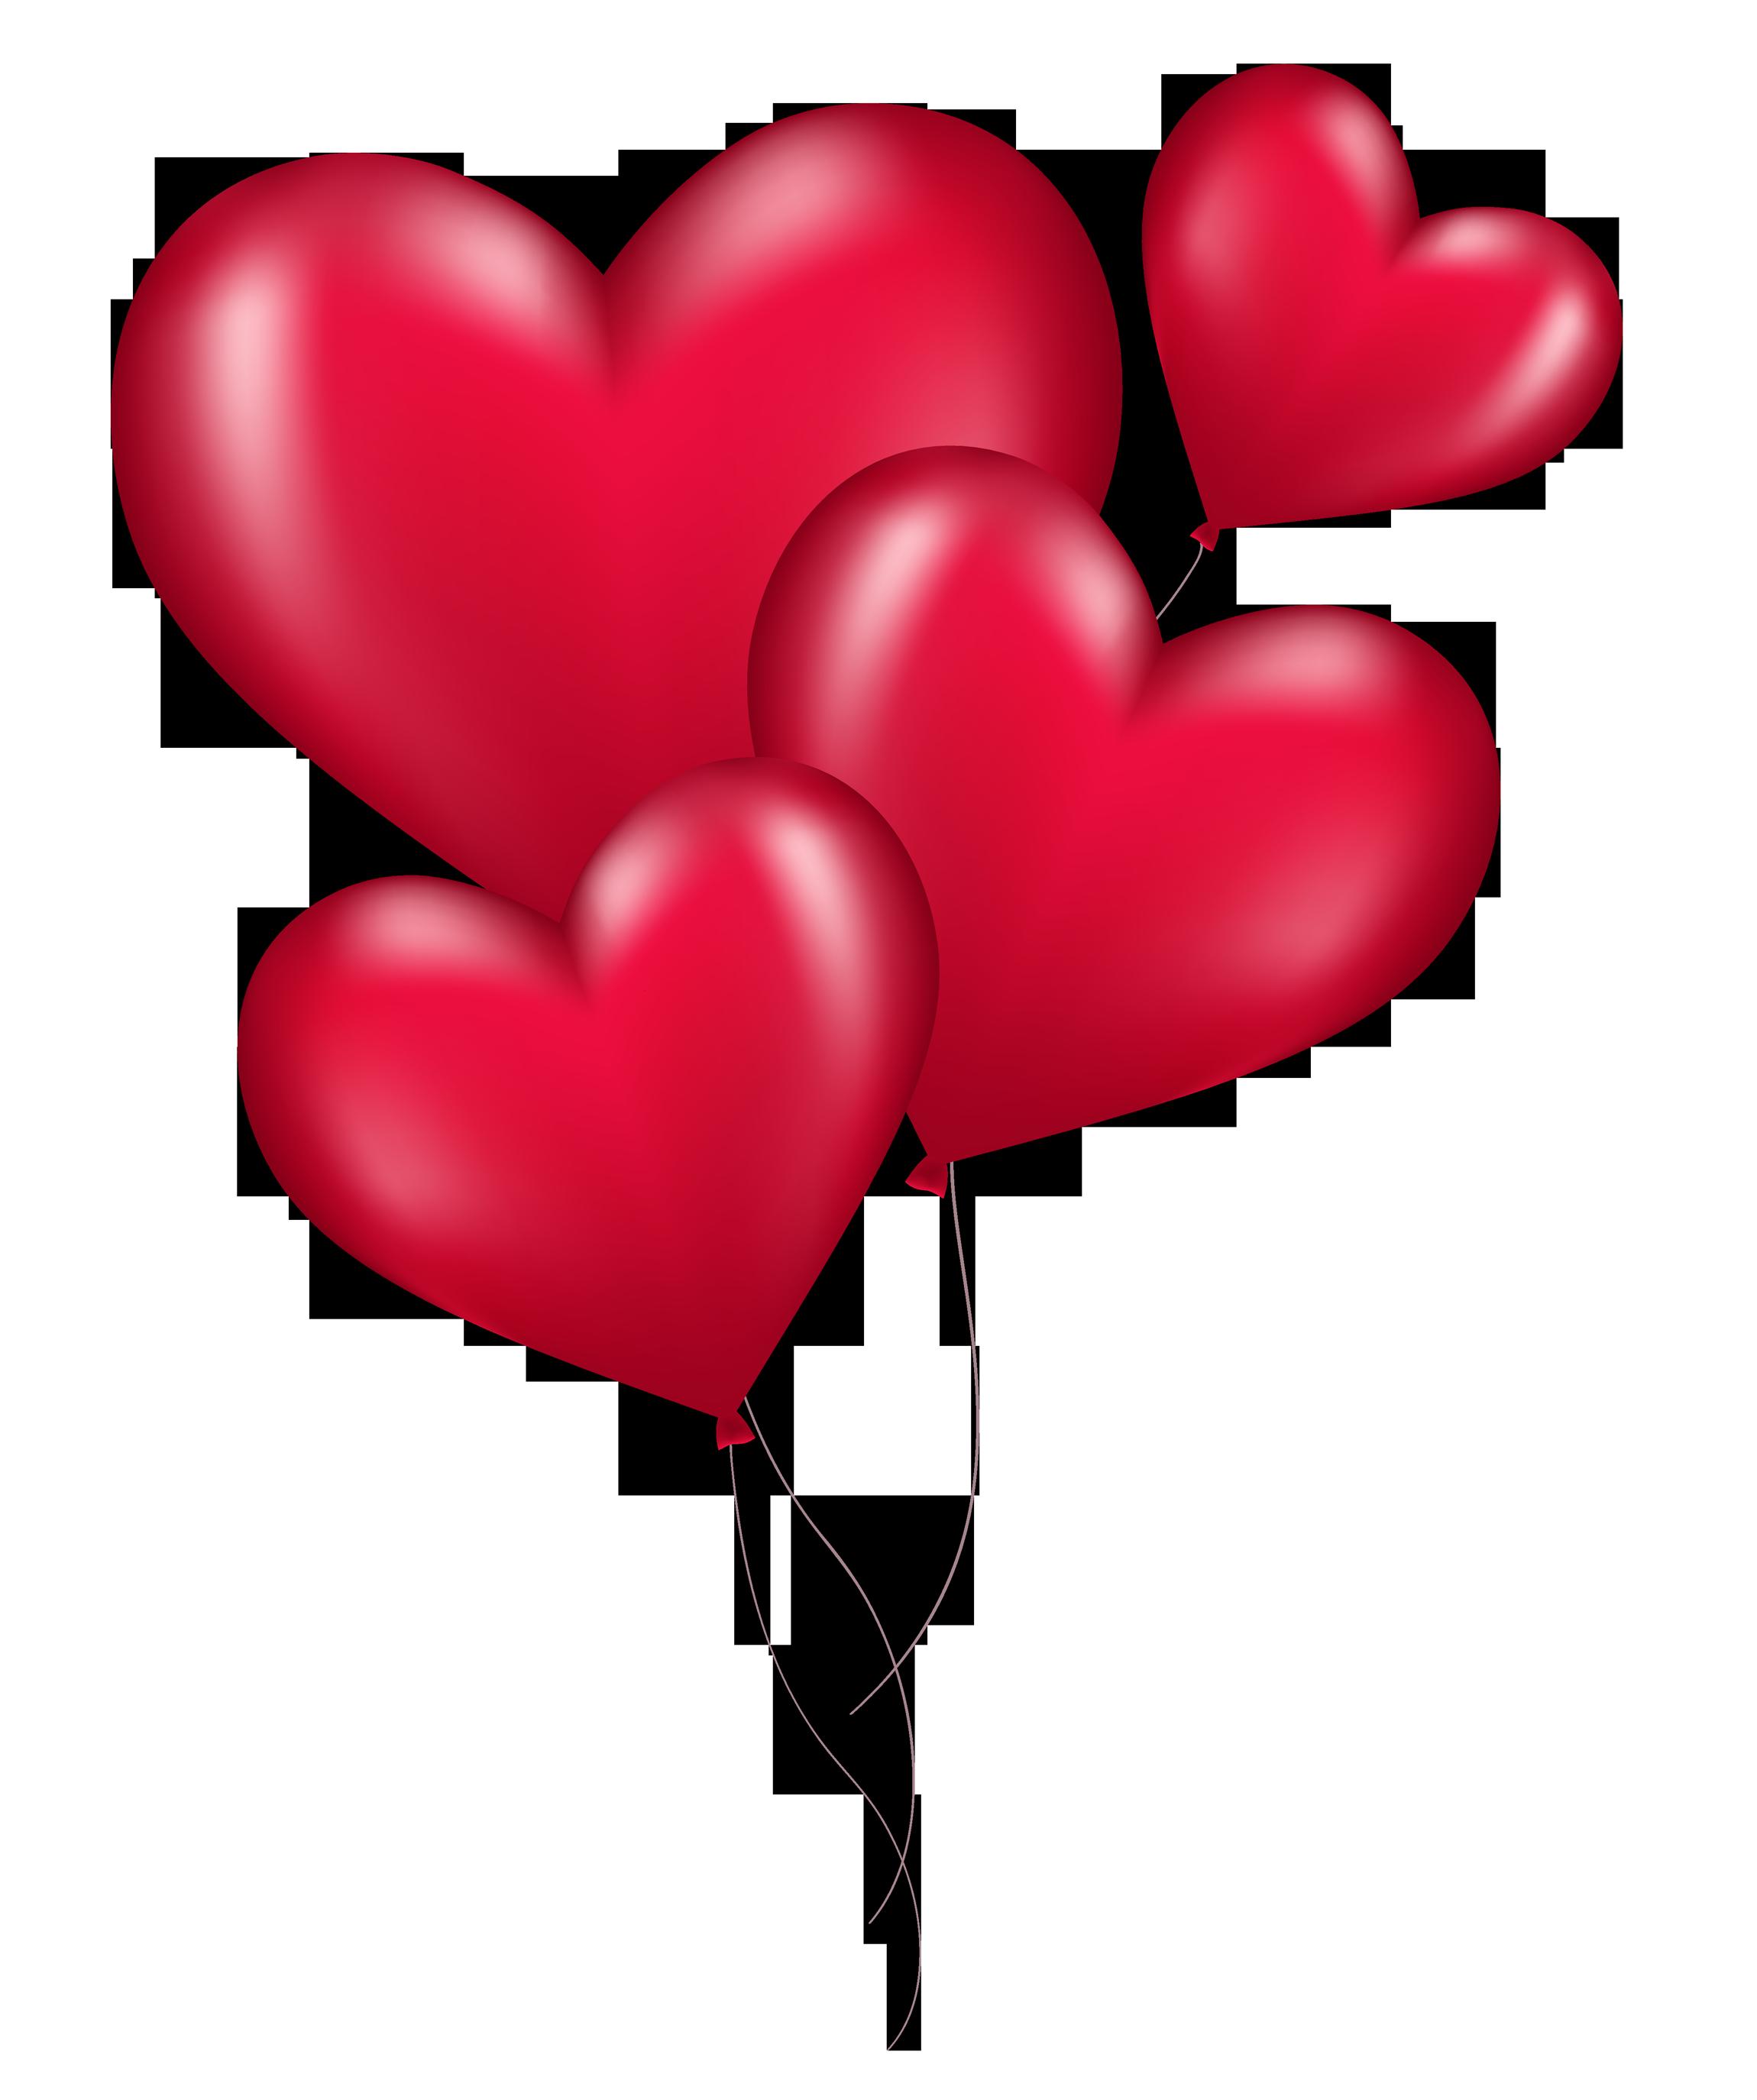 Heart clipart bouquet. Balloons png image pngpix